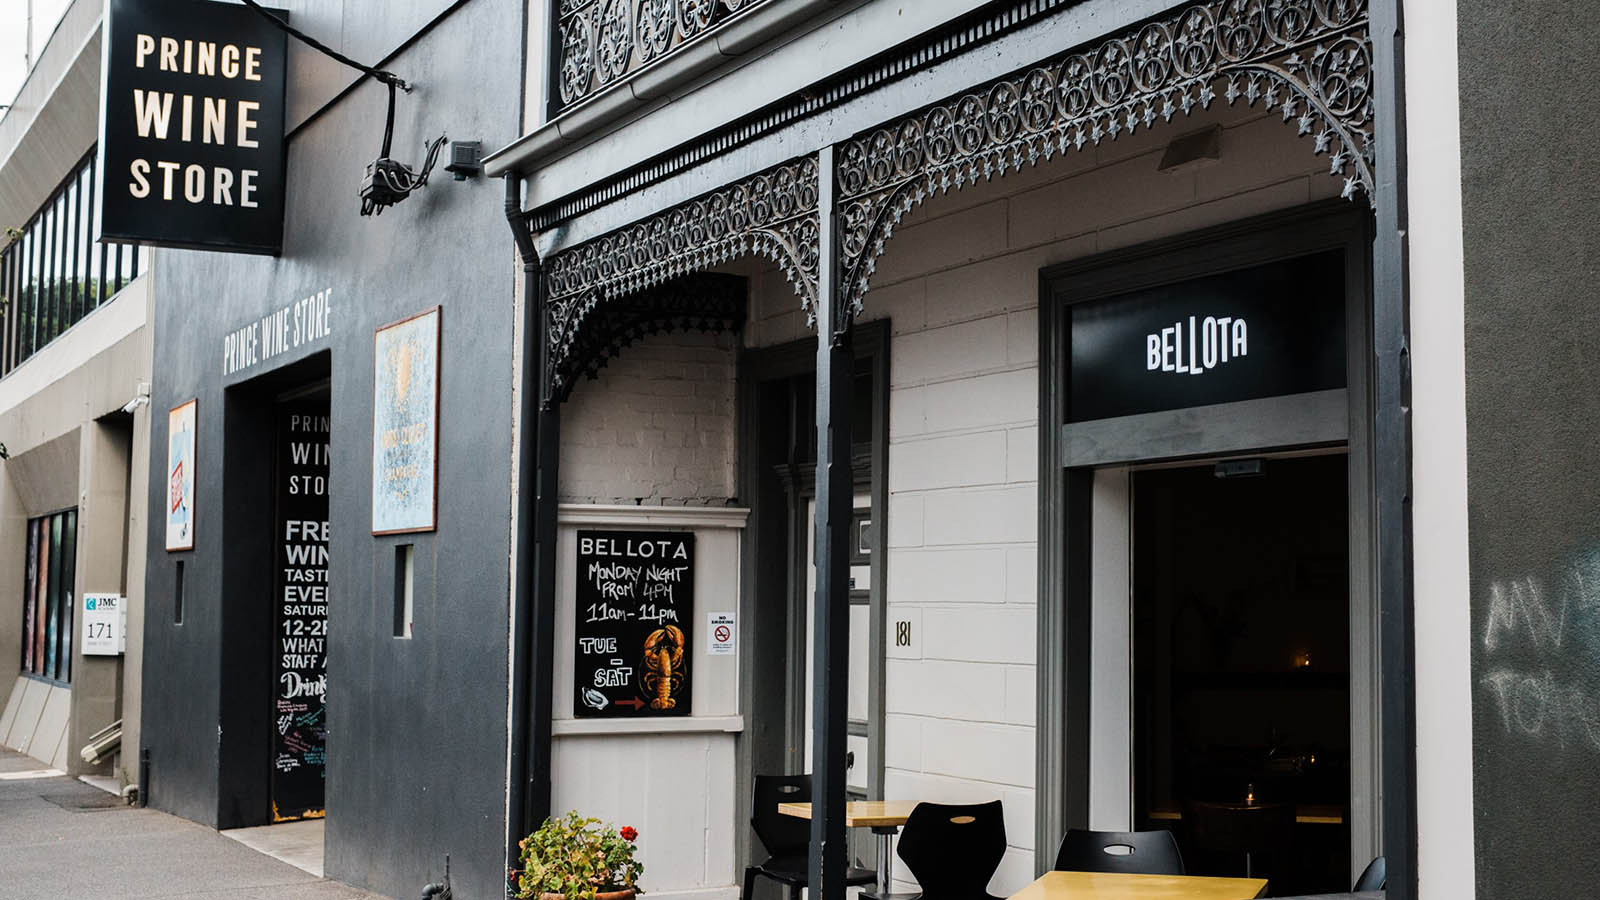 Bellota, Melbourne, Victoria, Australia. Credit: Melissa Cowan